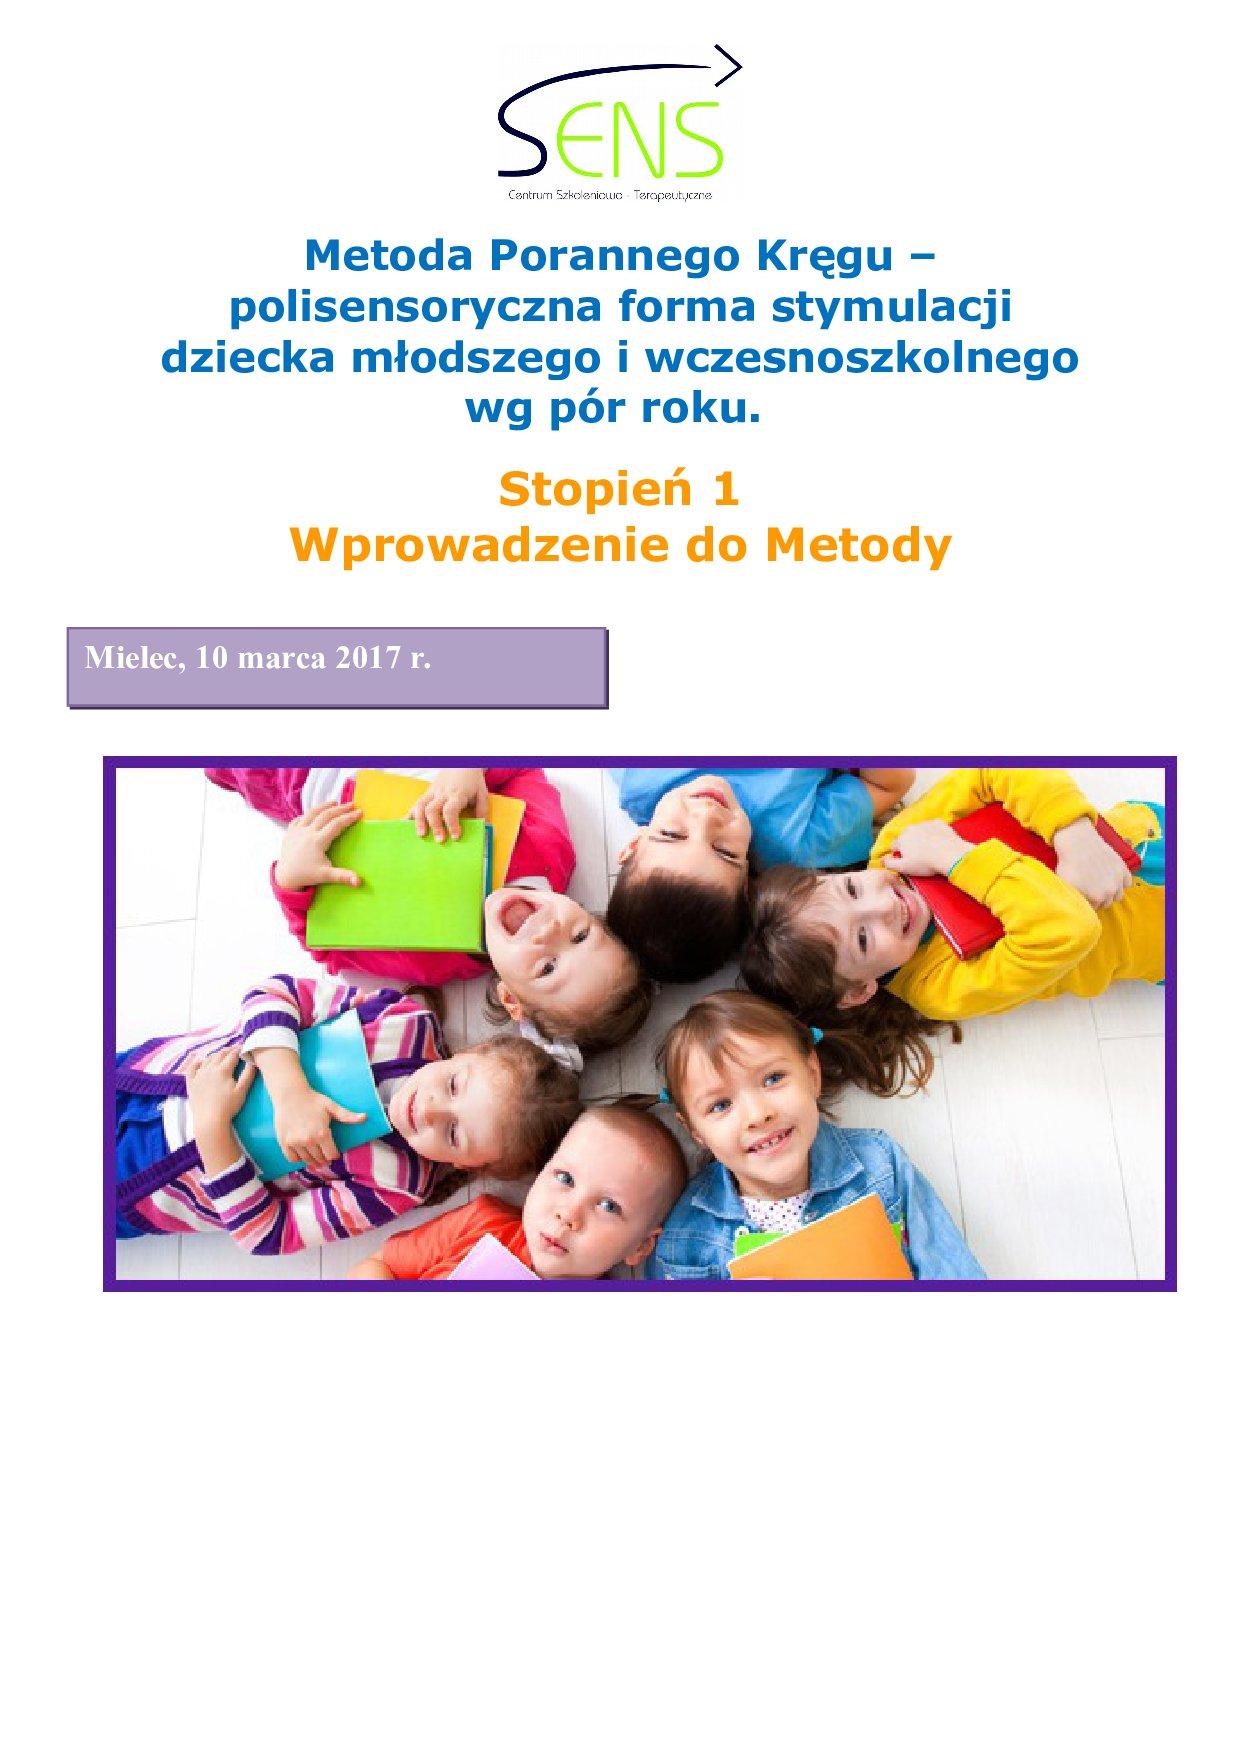 Mielec. Poranny krąg część 1. 10.03.2017 r.